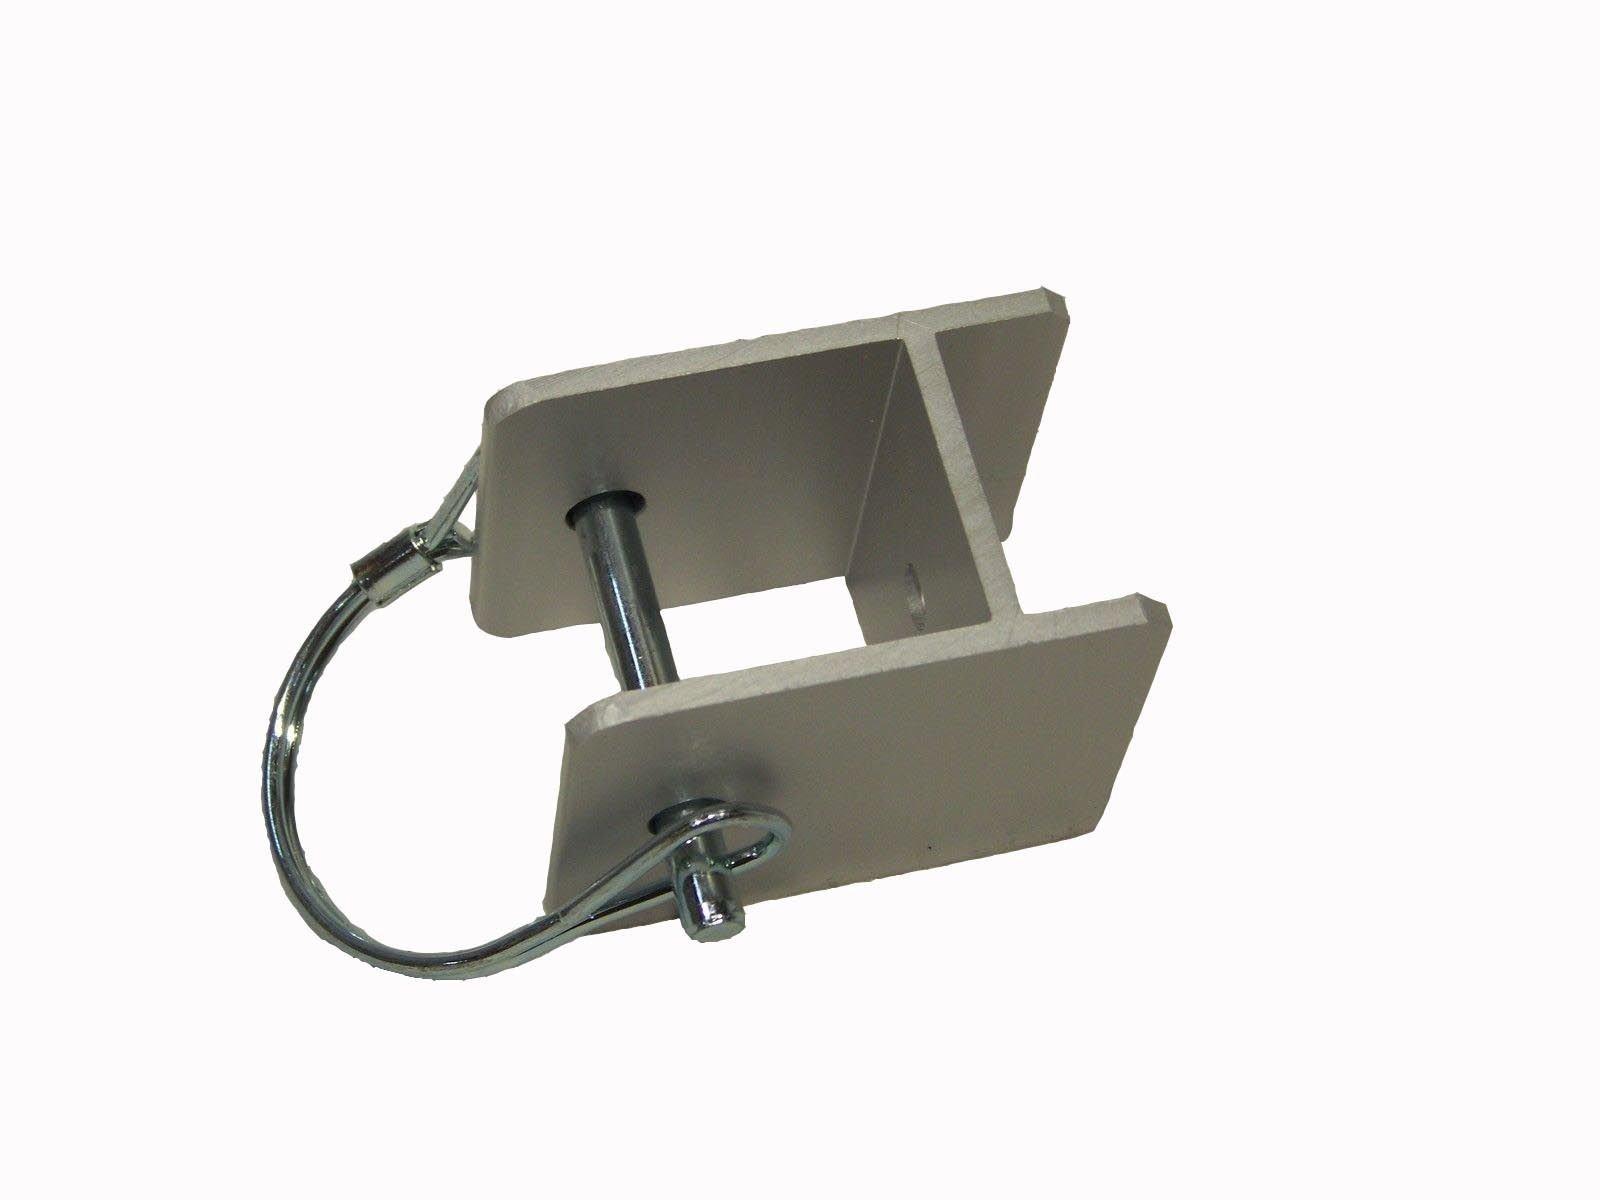 Bimini Top Hardware: Deck Hinge 1 1/4'' Square